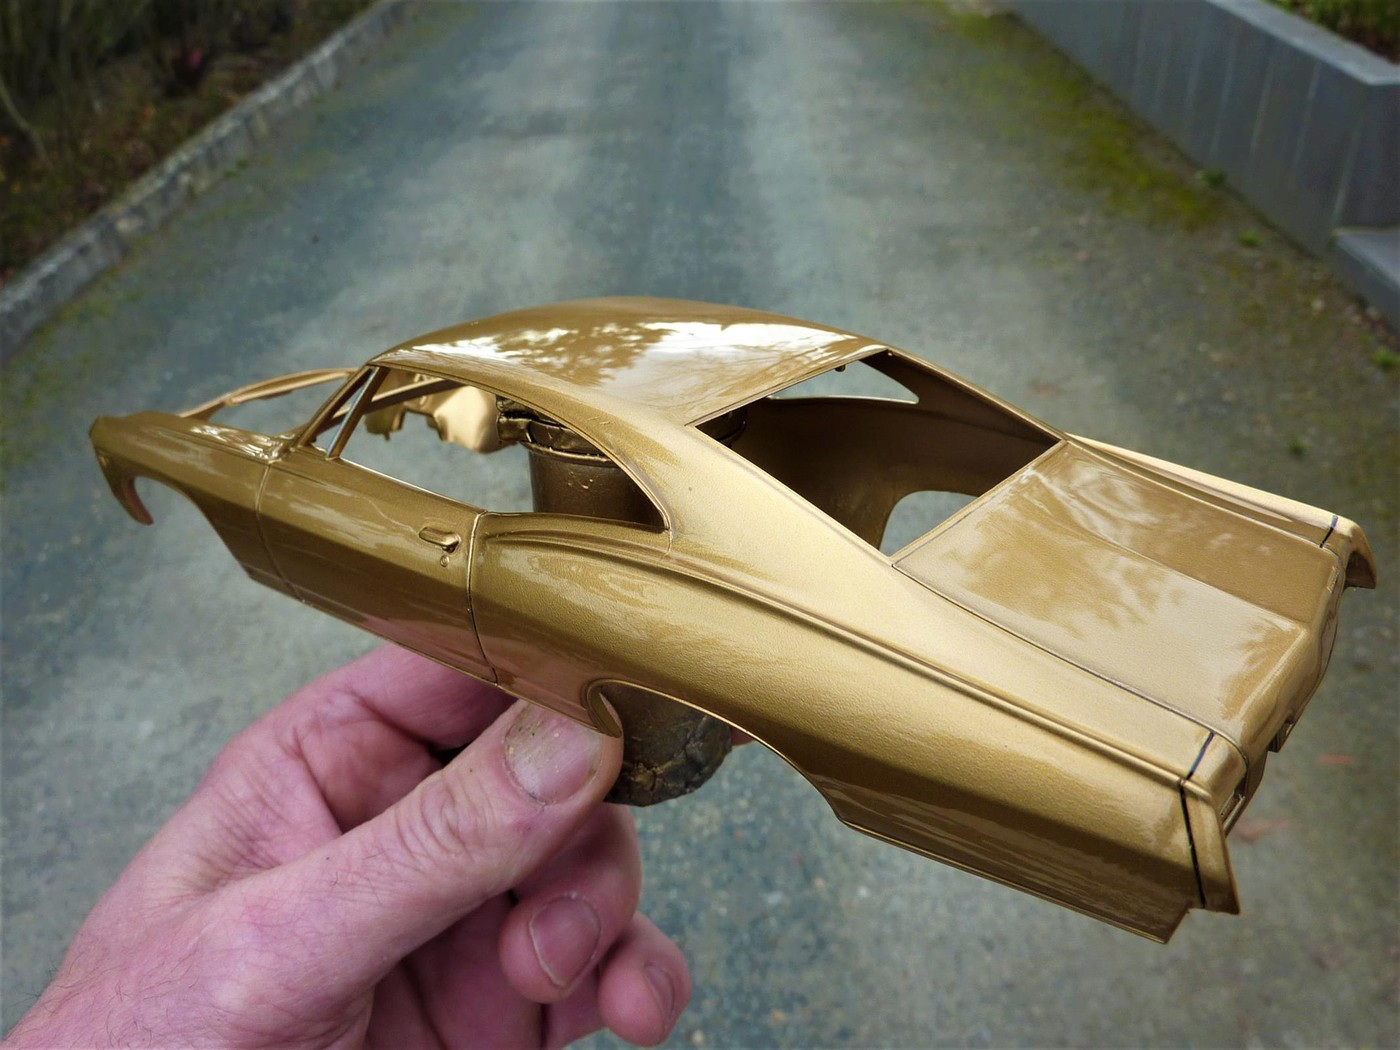 Chevrolet Impala 67 Términée Photo-vi